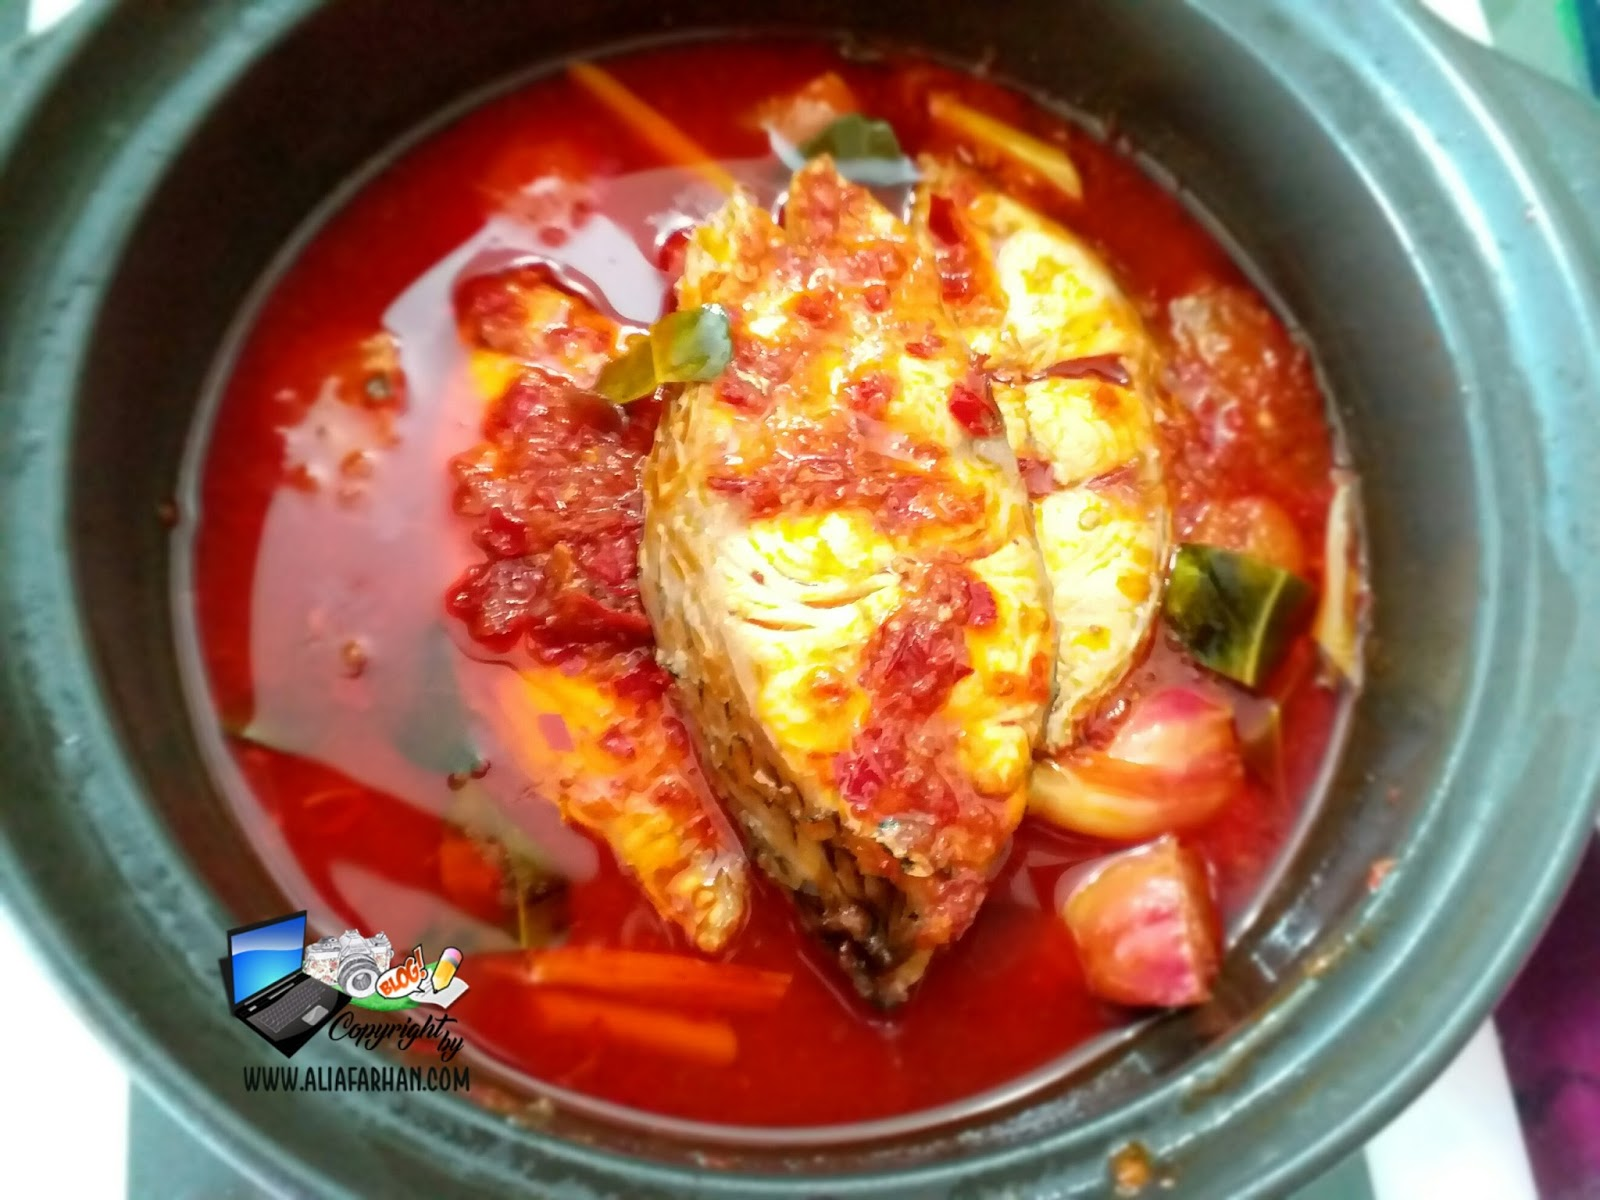 resepi ikan selayang masak asam pedas resep bunda erita Resepi Ikan Tenggiri Pais Enak dan Mudah